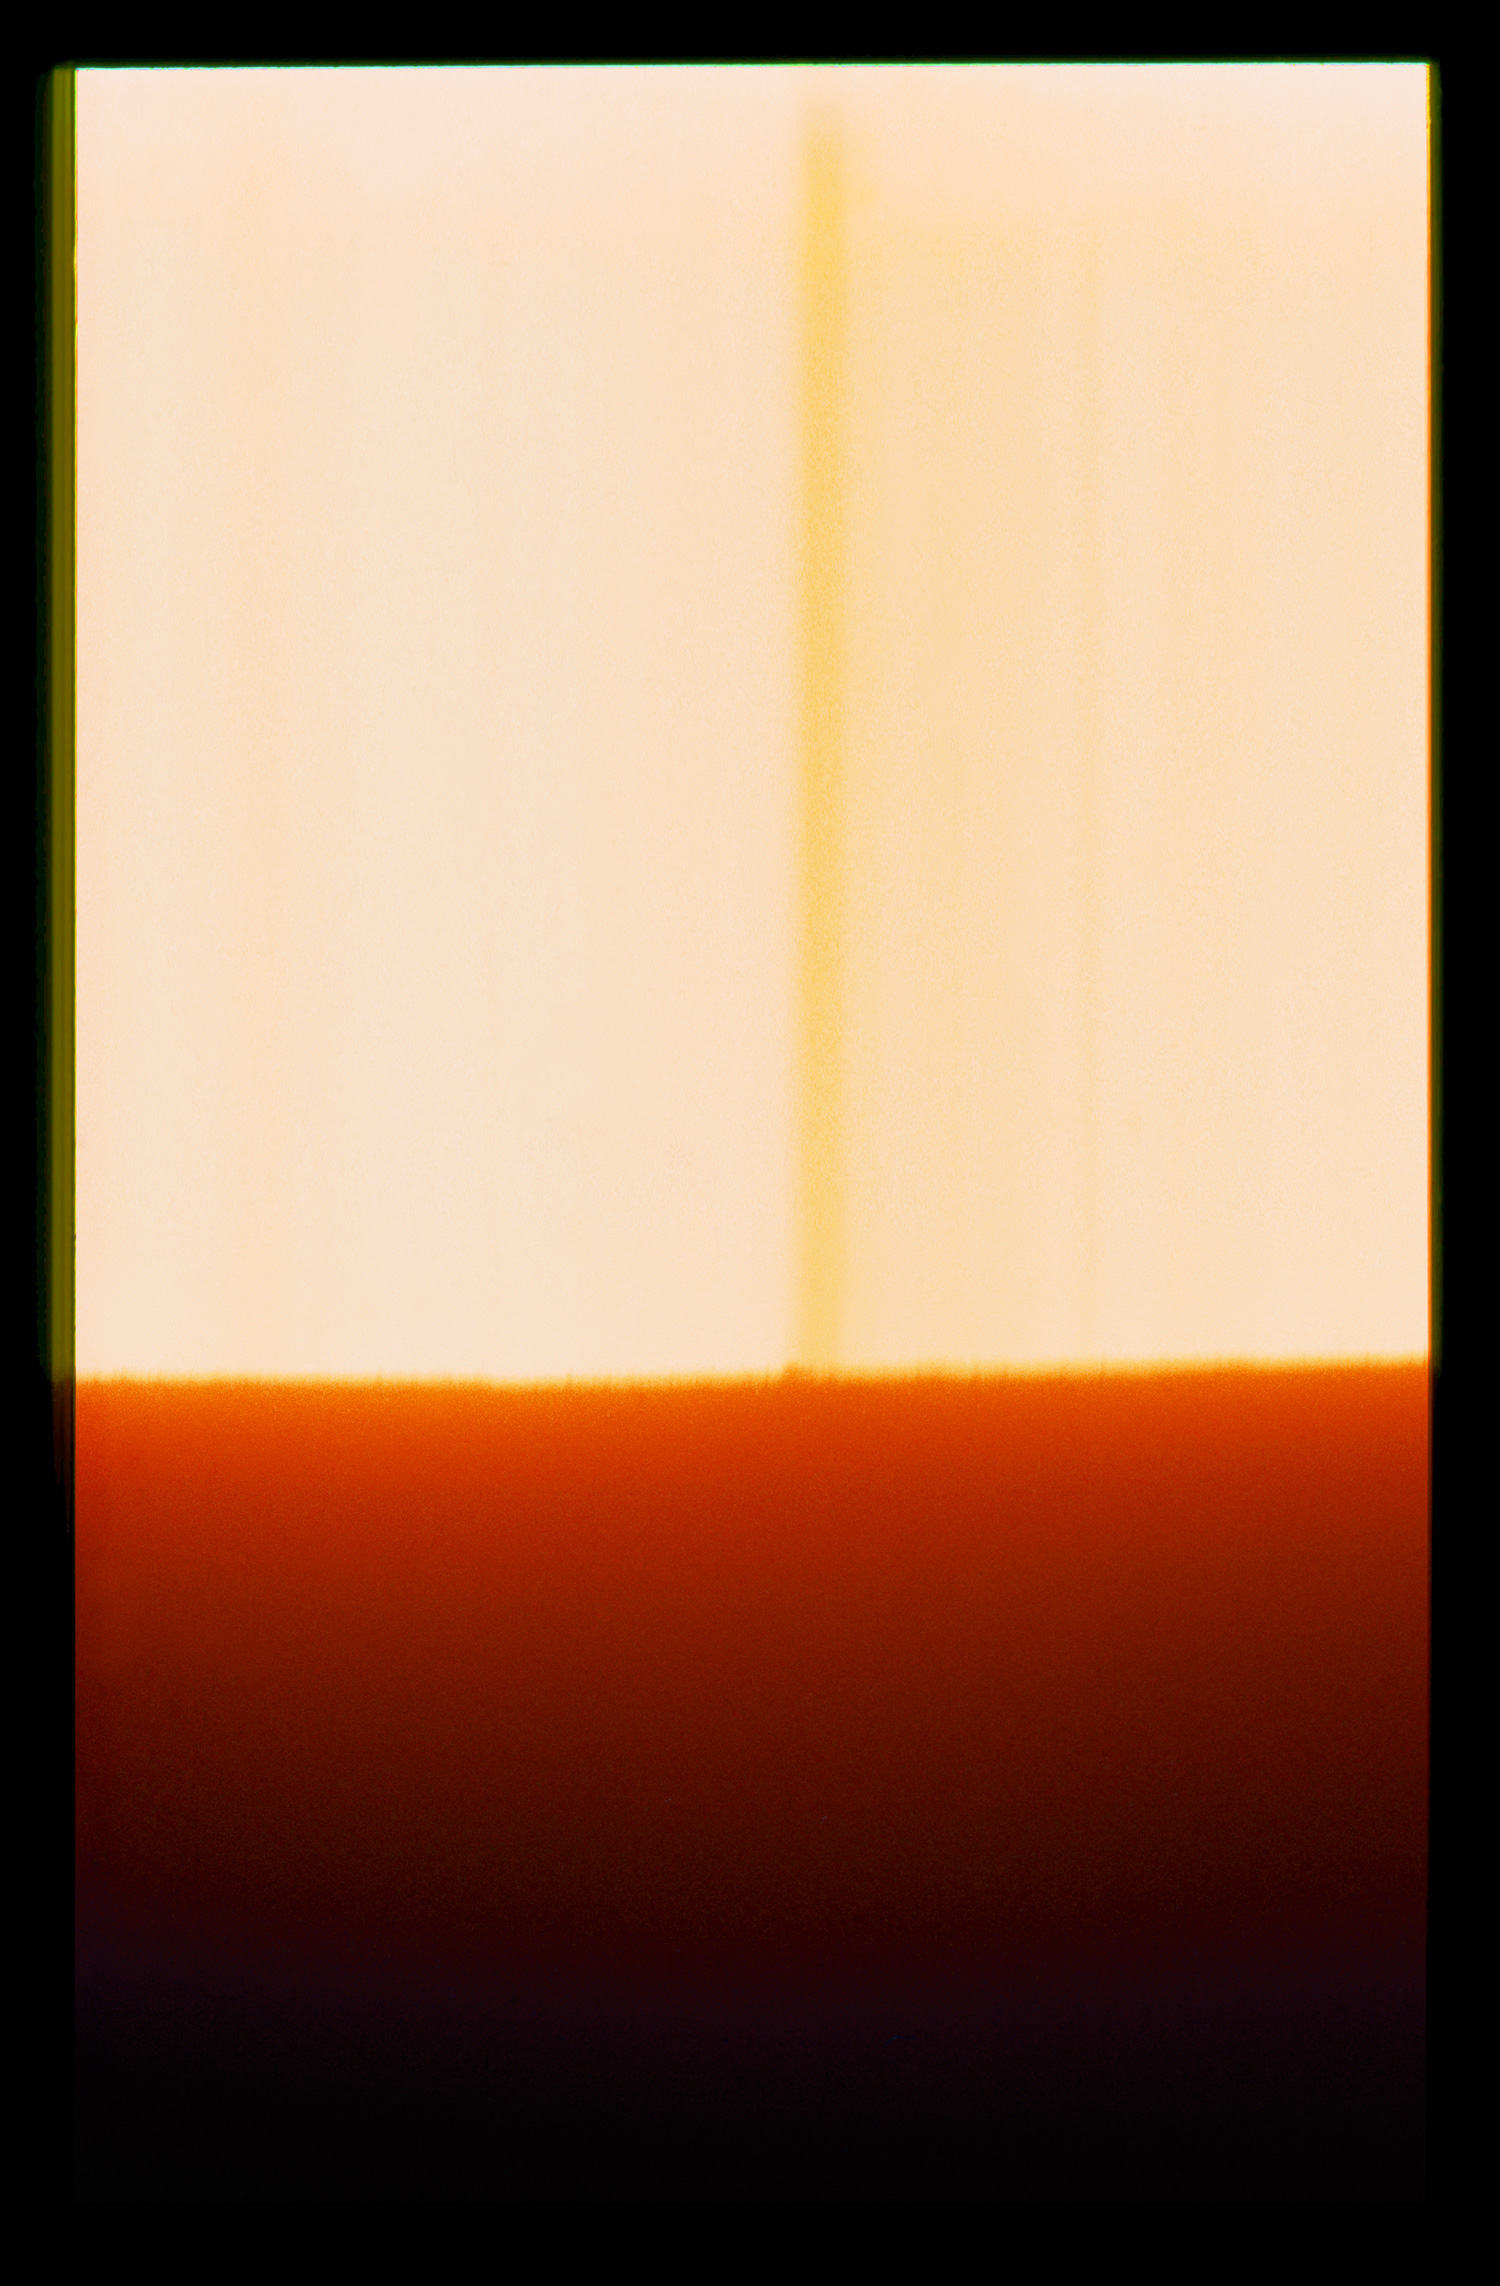 Endings - Kodachrome 64, No.00. 22/07/1992